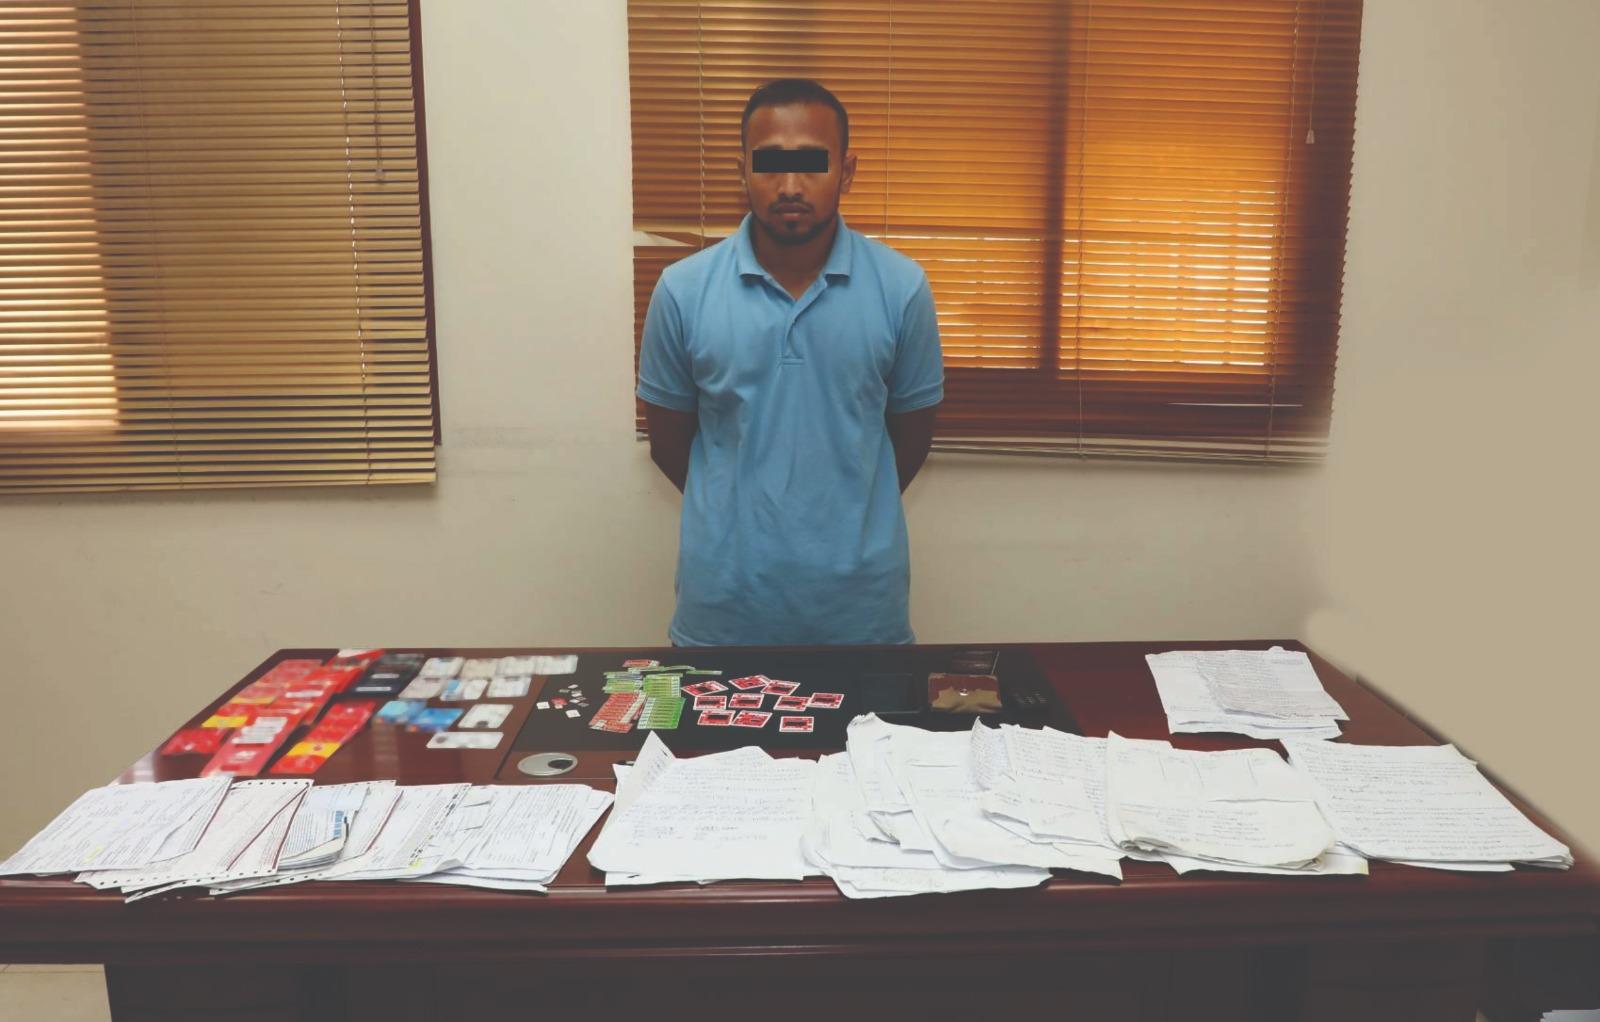 Special squad arrests a gang formation who stole 10 million Qatari riyals by wire fraud